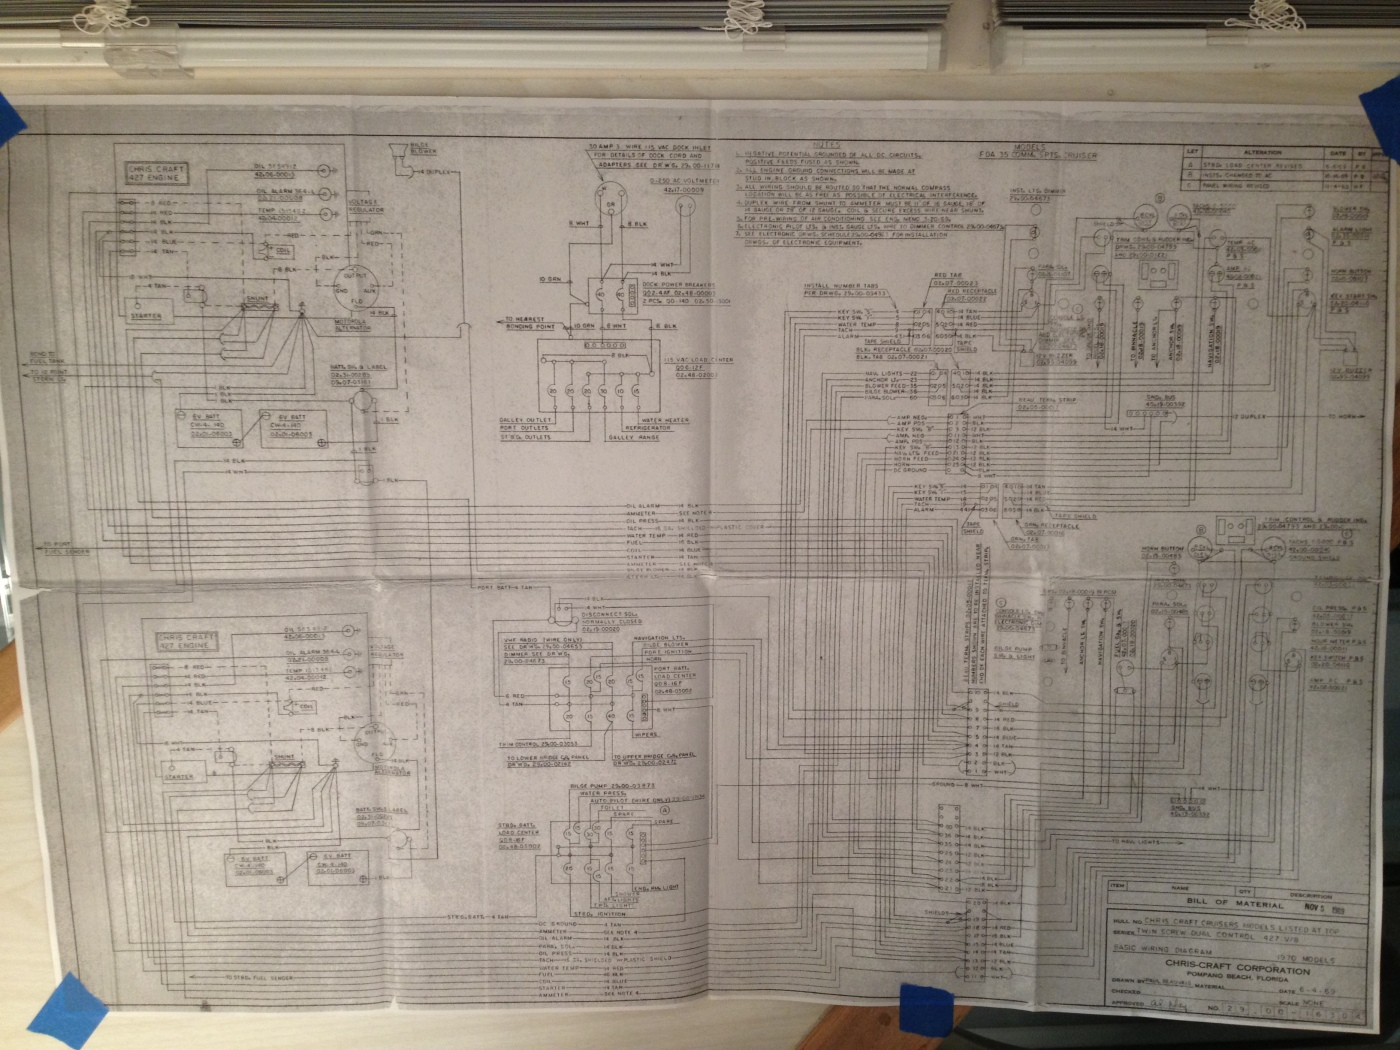 283 Wiring Diagram Vdo Speedometer Wiring Diagram Code 03 Honda Accordd Waystar Fr